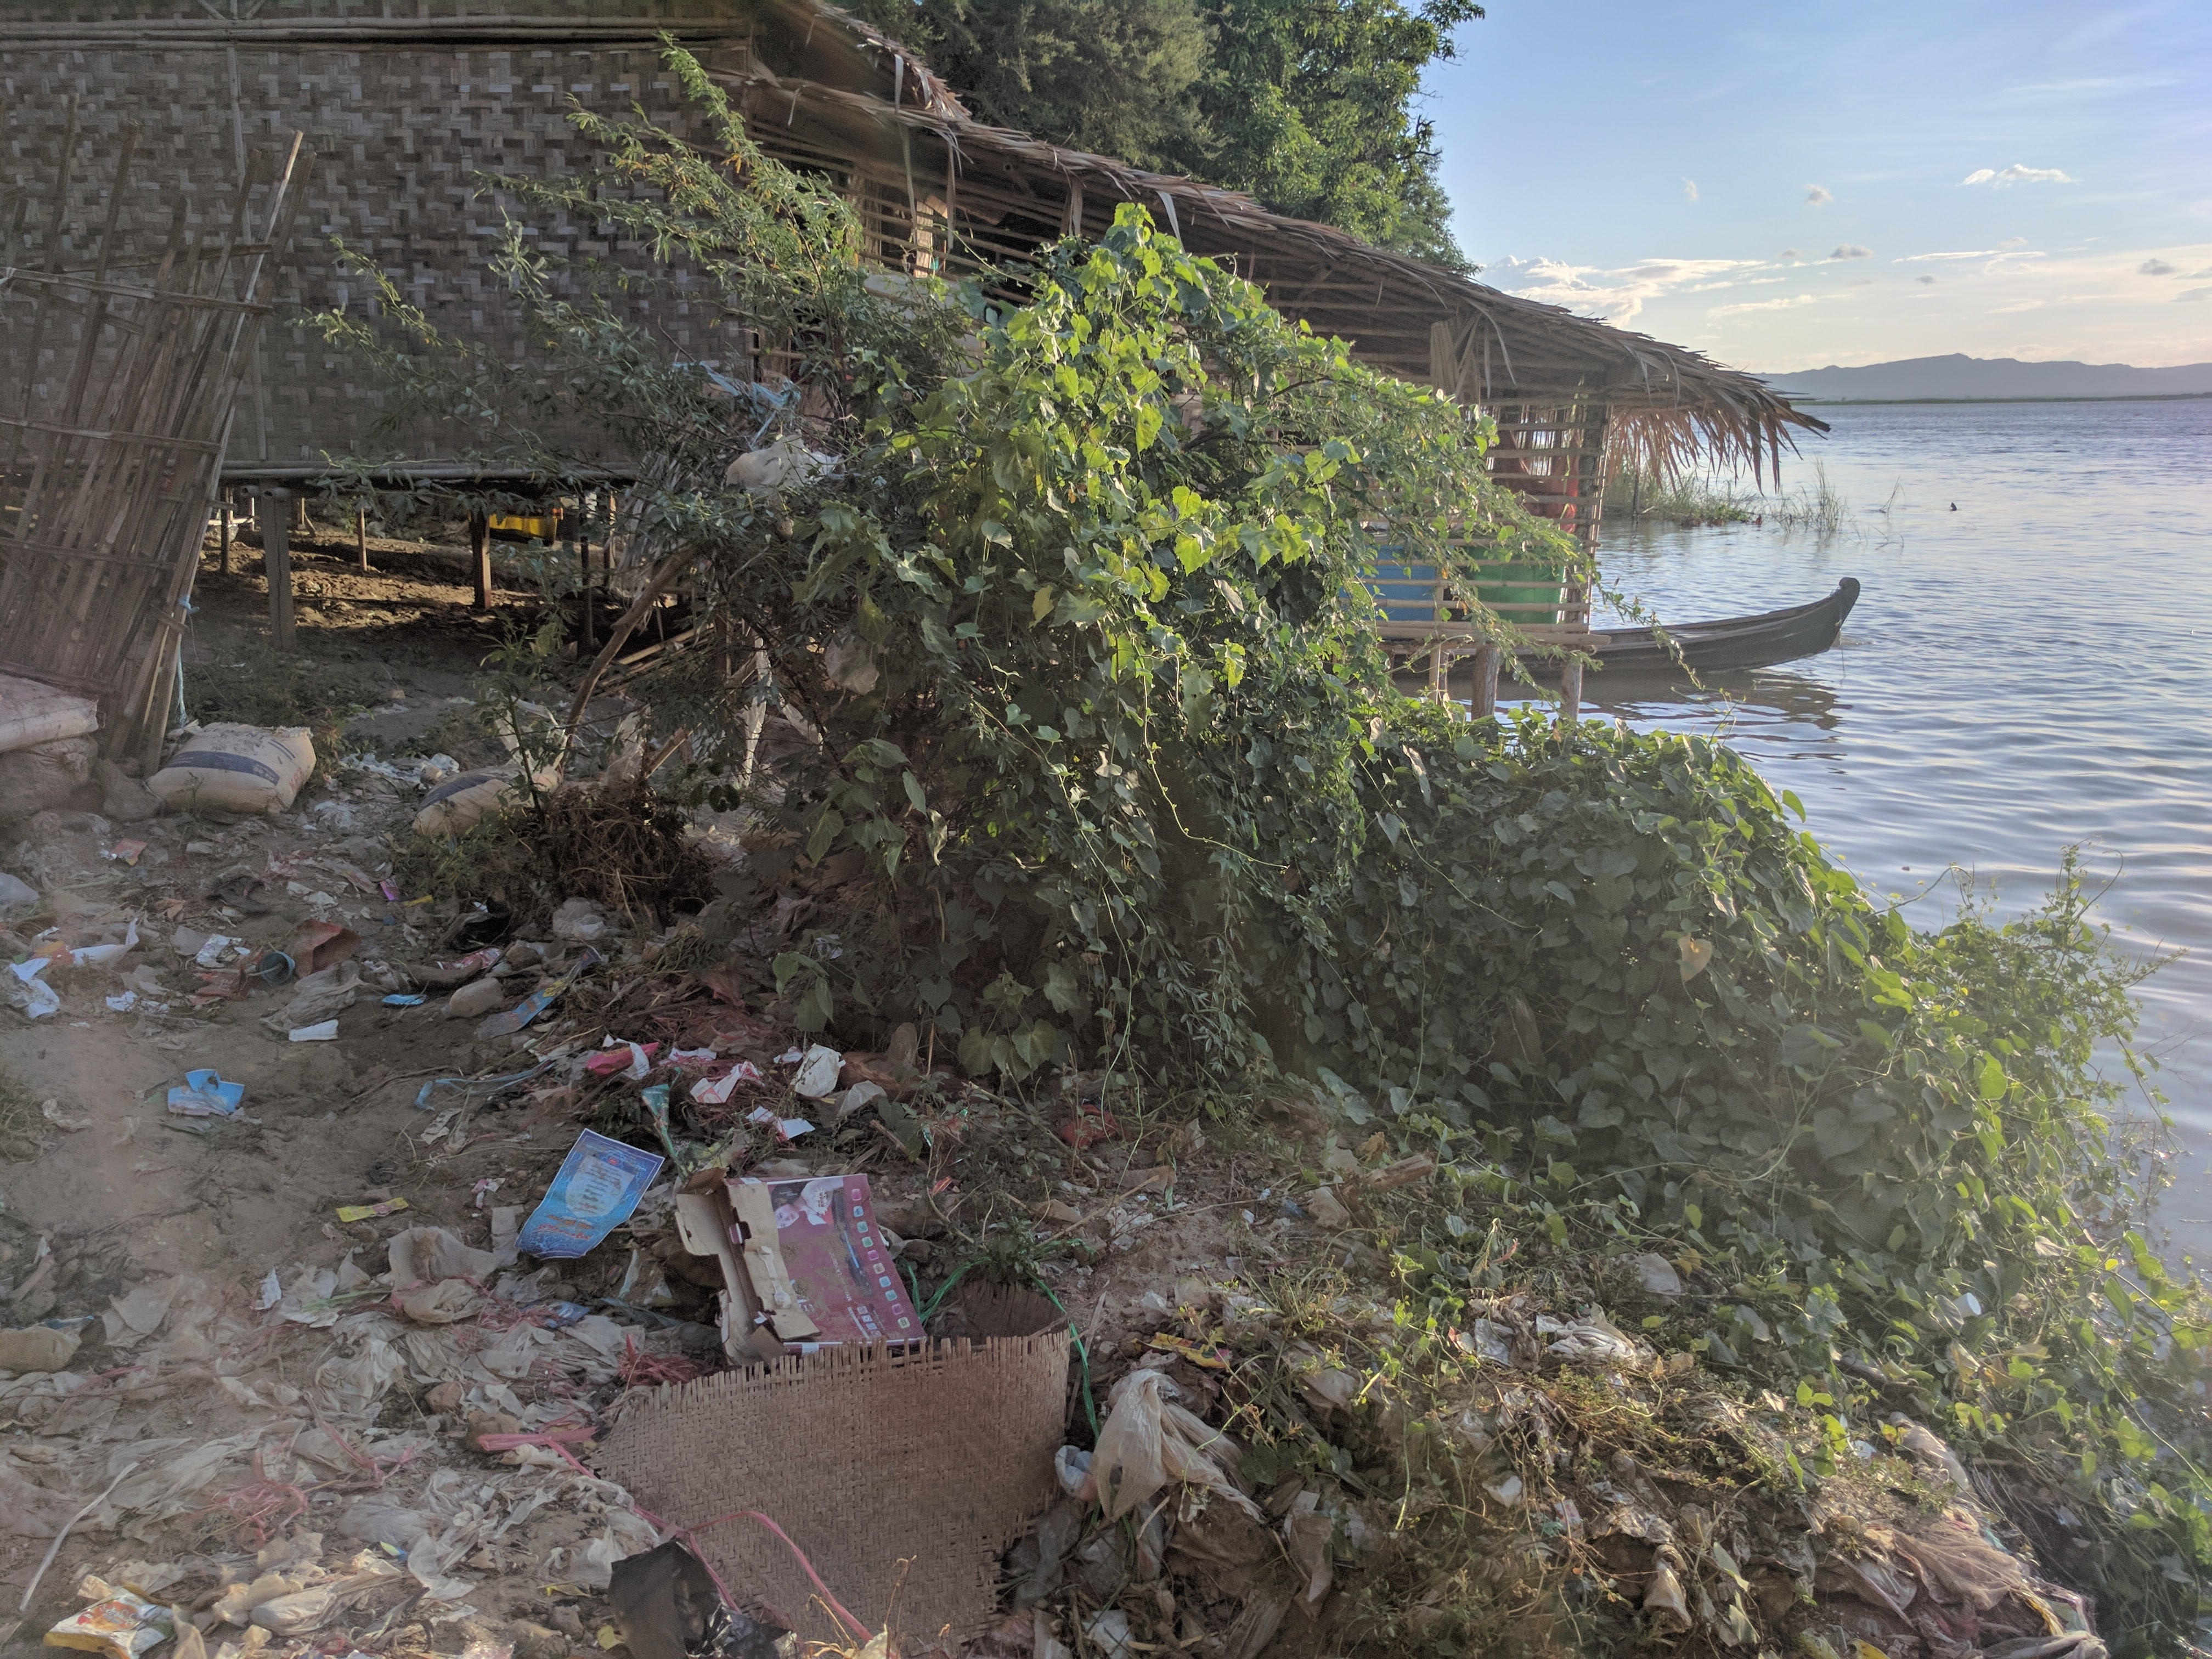 Plastique riviere Bagan